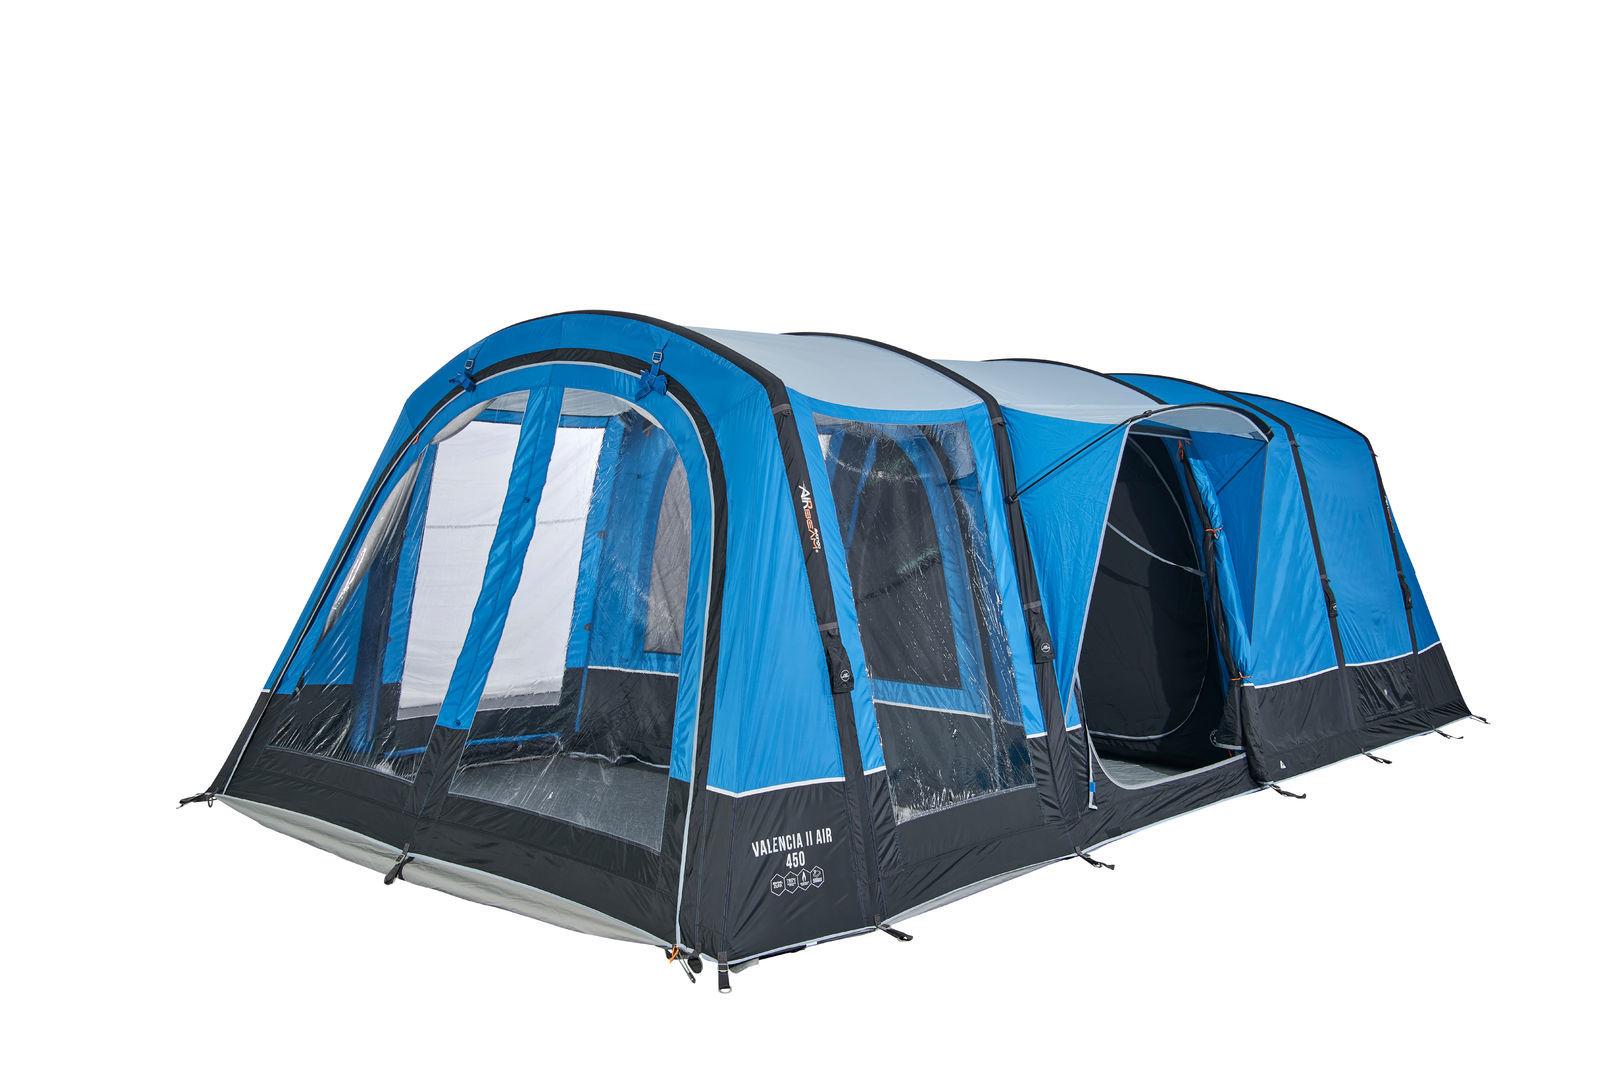 Vango Valencia Ii Air 450 2021 Norwich Camping 7